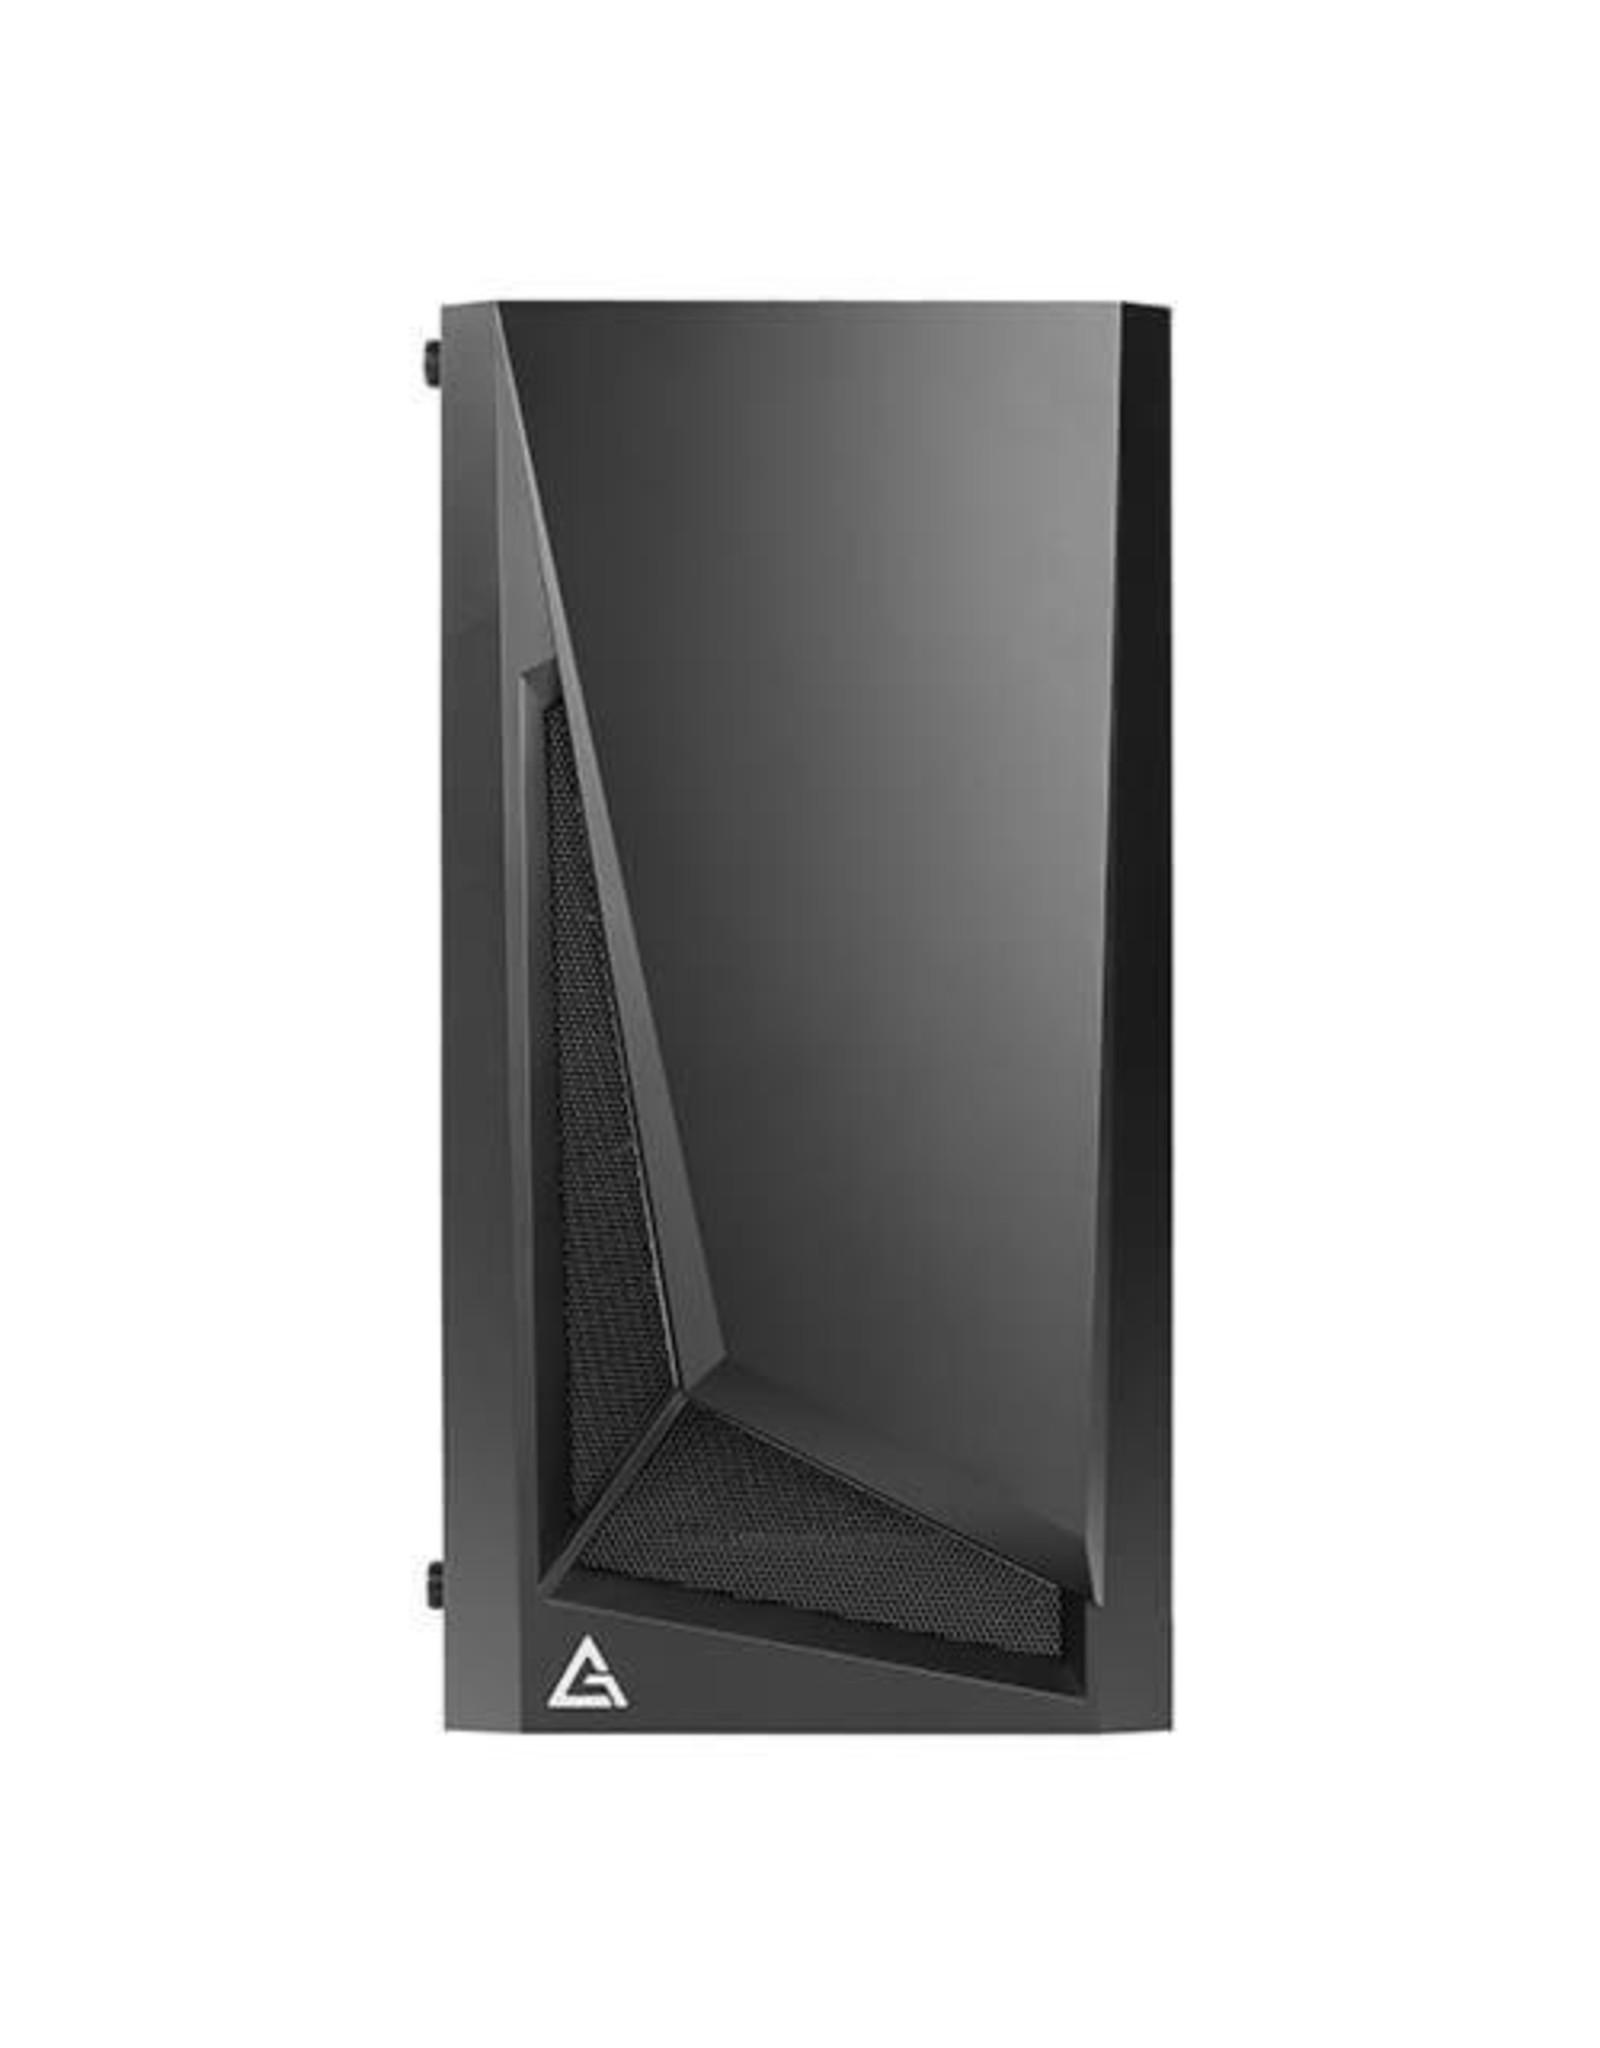 Antec Case  DP301M Black / micro-ATX mini-ITX / Window / RGB